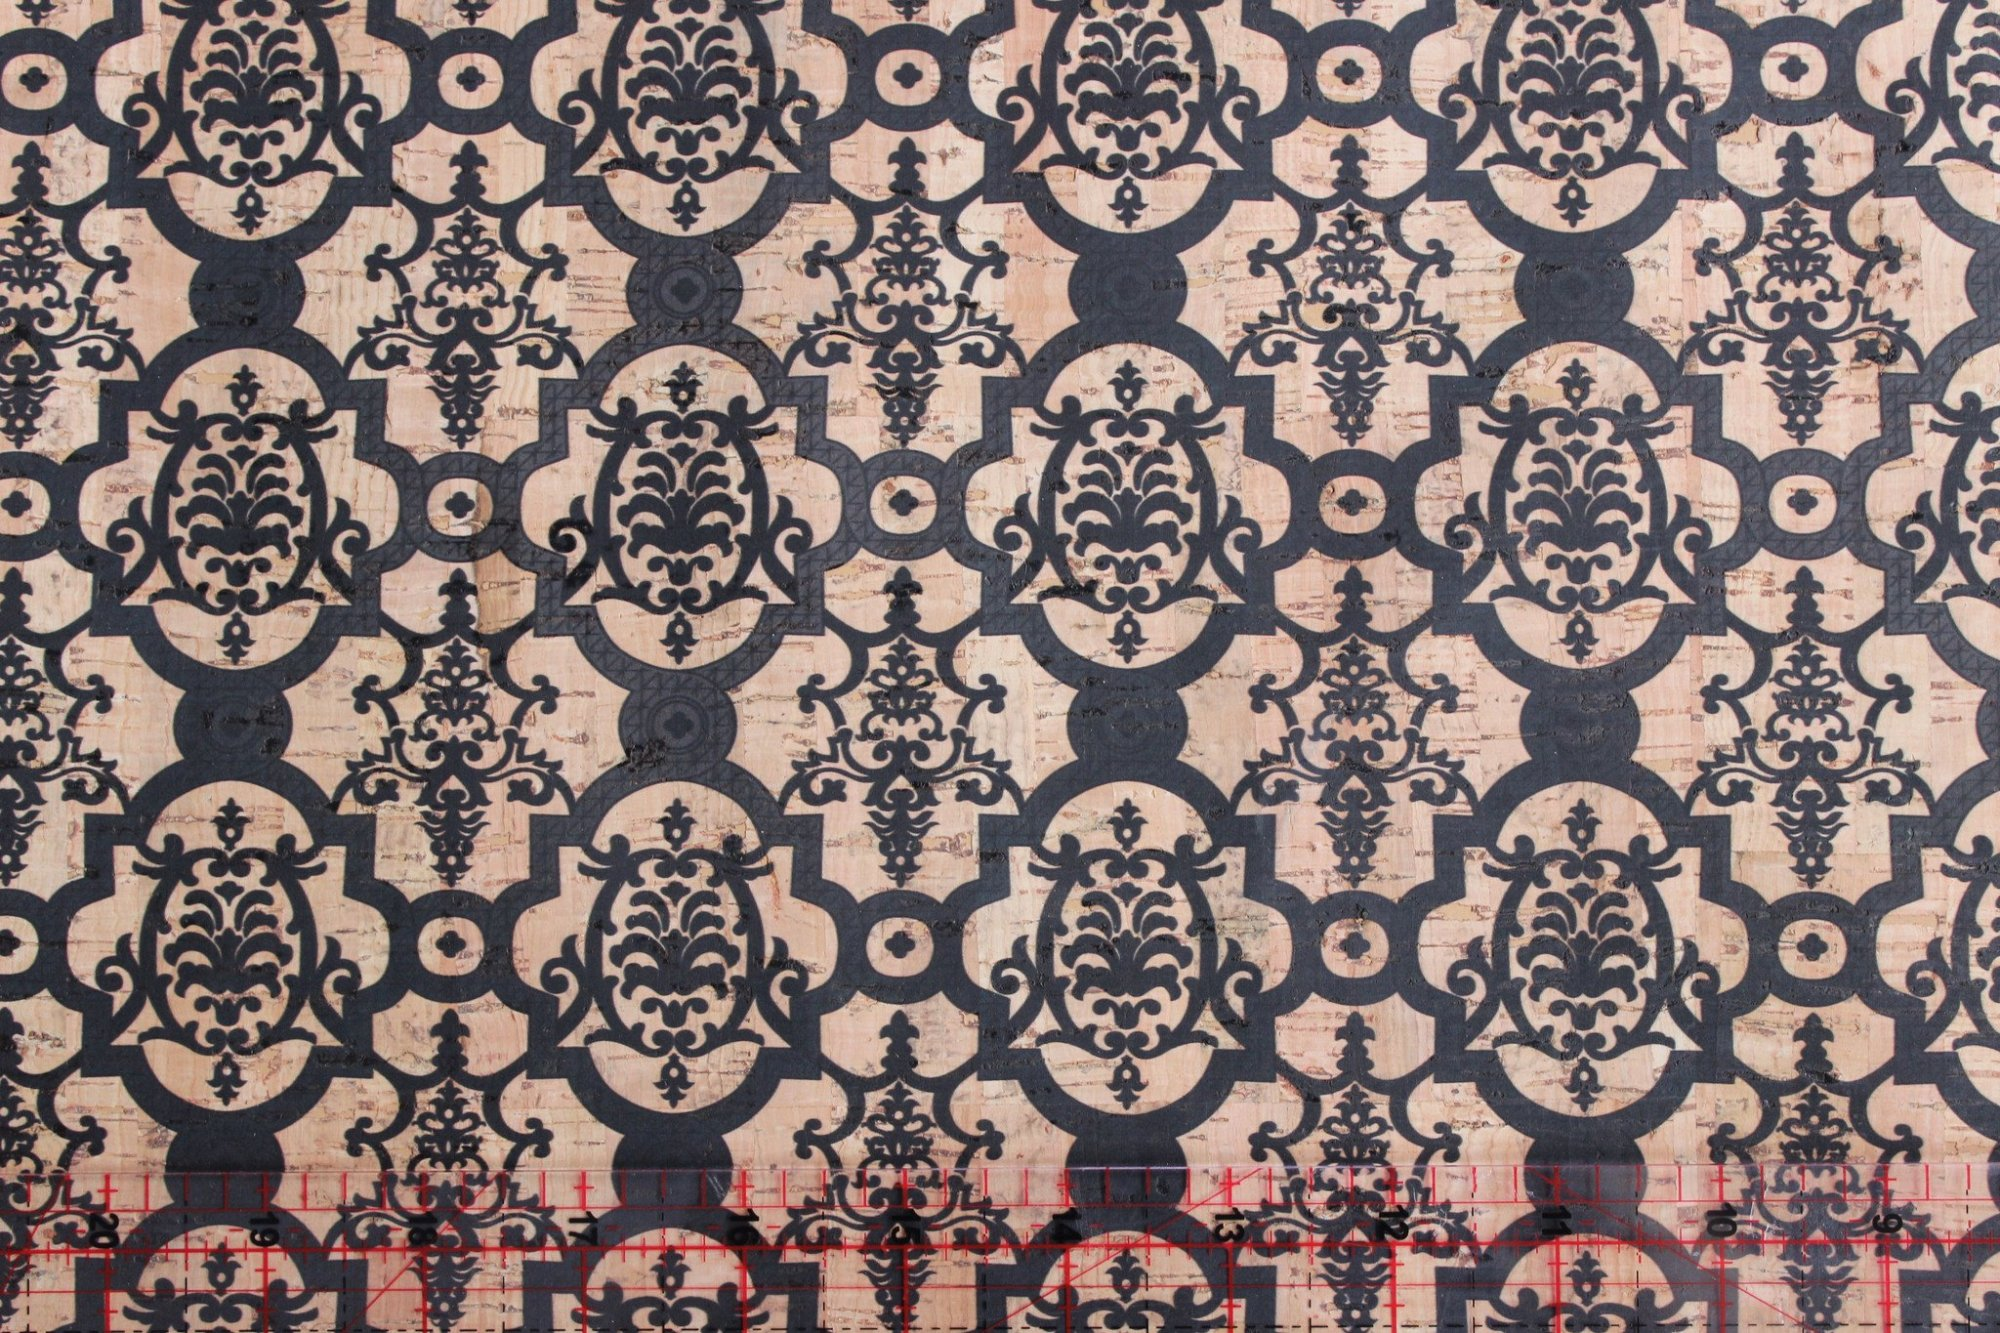 Printed Turtle Damask Cork Fabric (18x18)